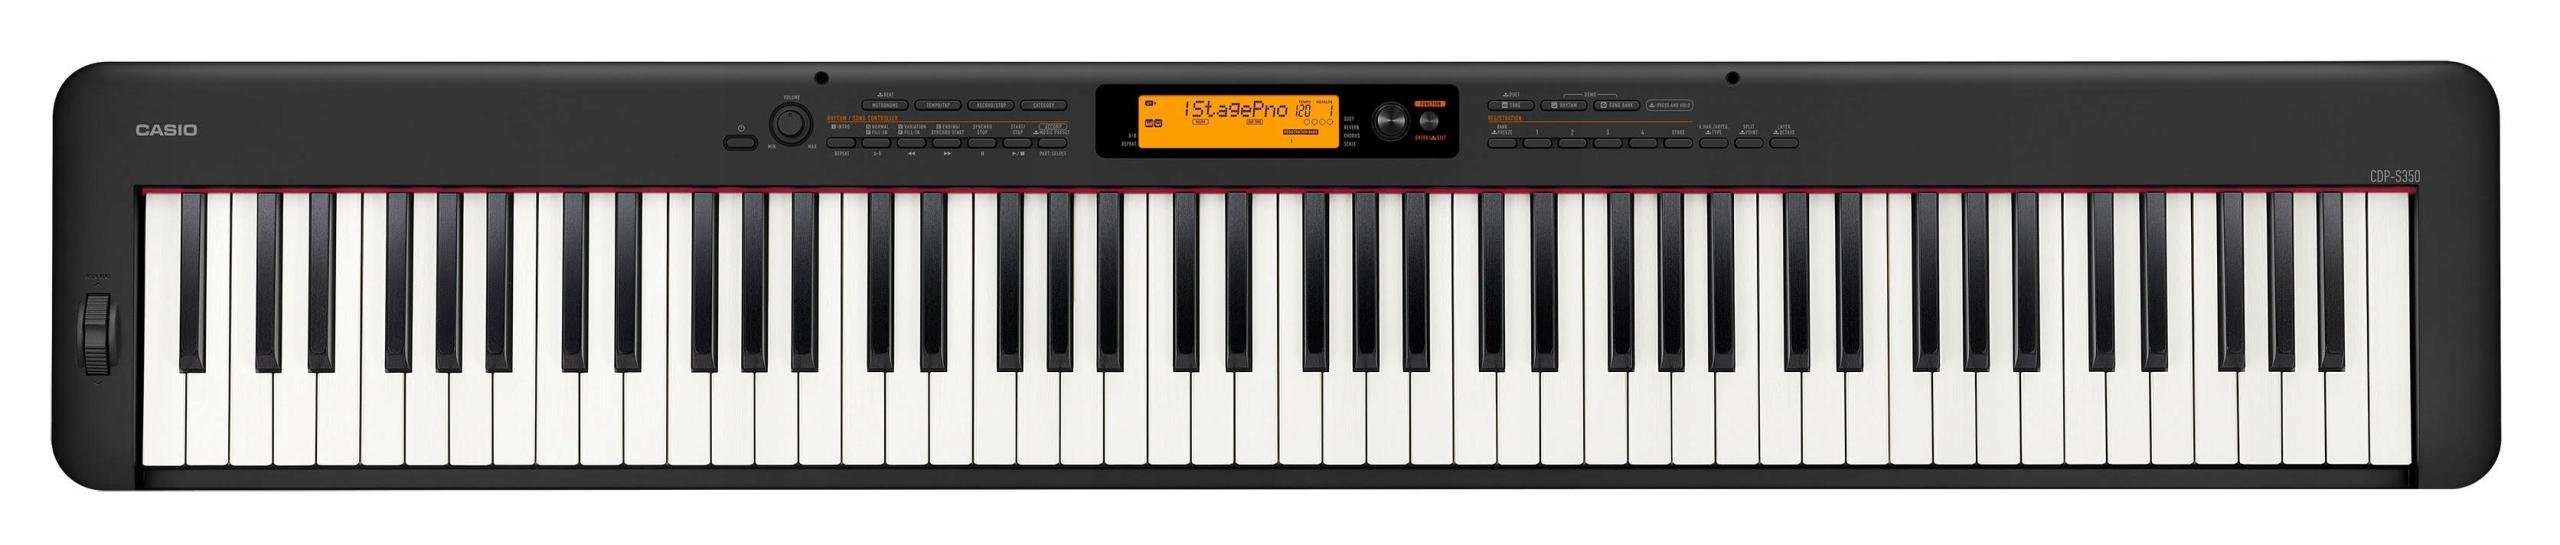 CASIO CDP-S350 BK - DIGITAL PIANO